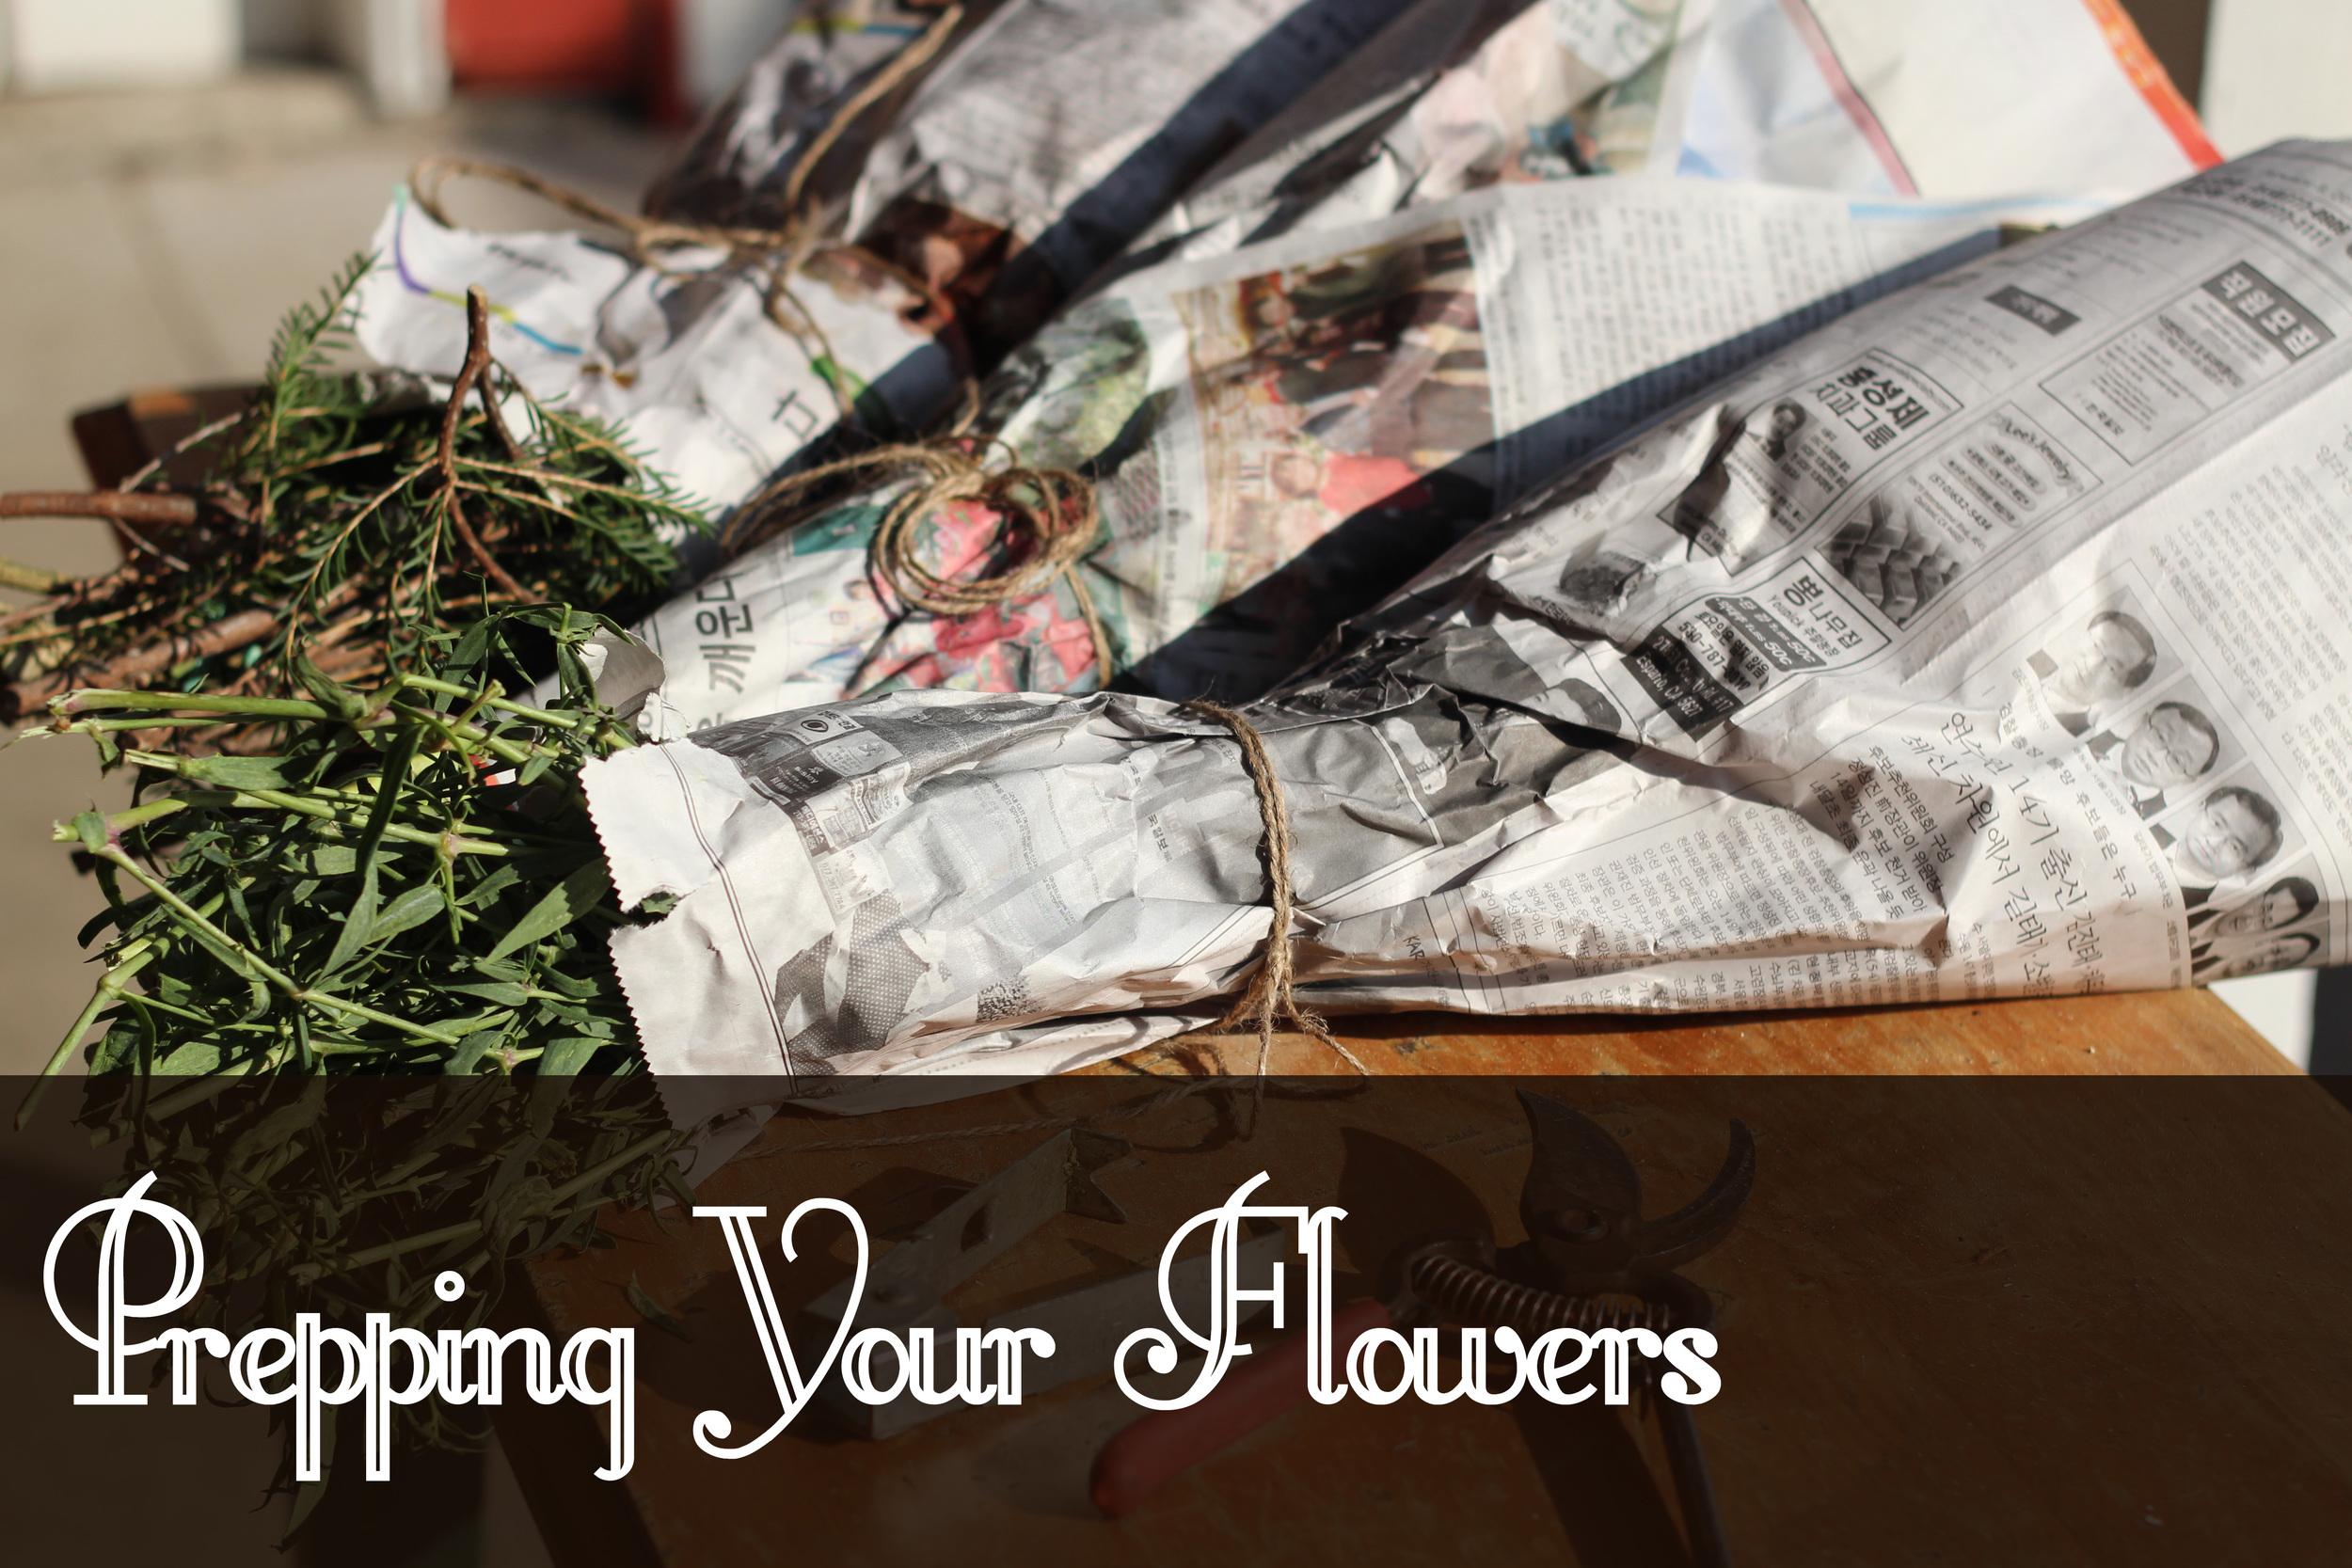 preppingyourflowers.jpg